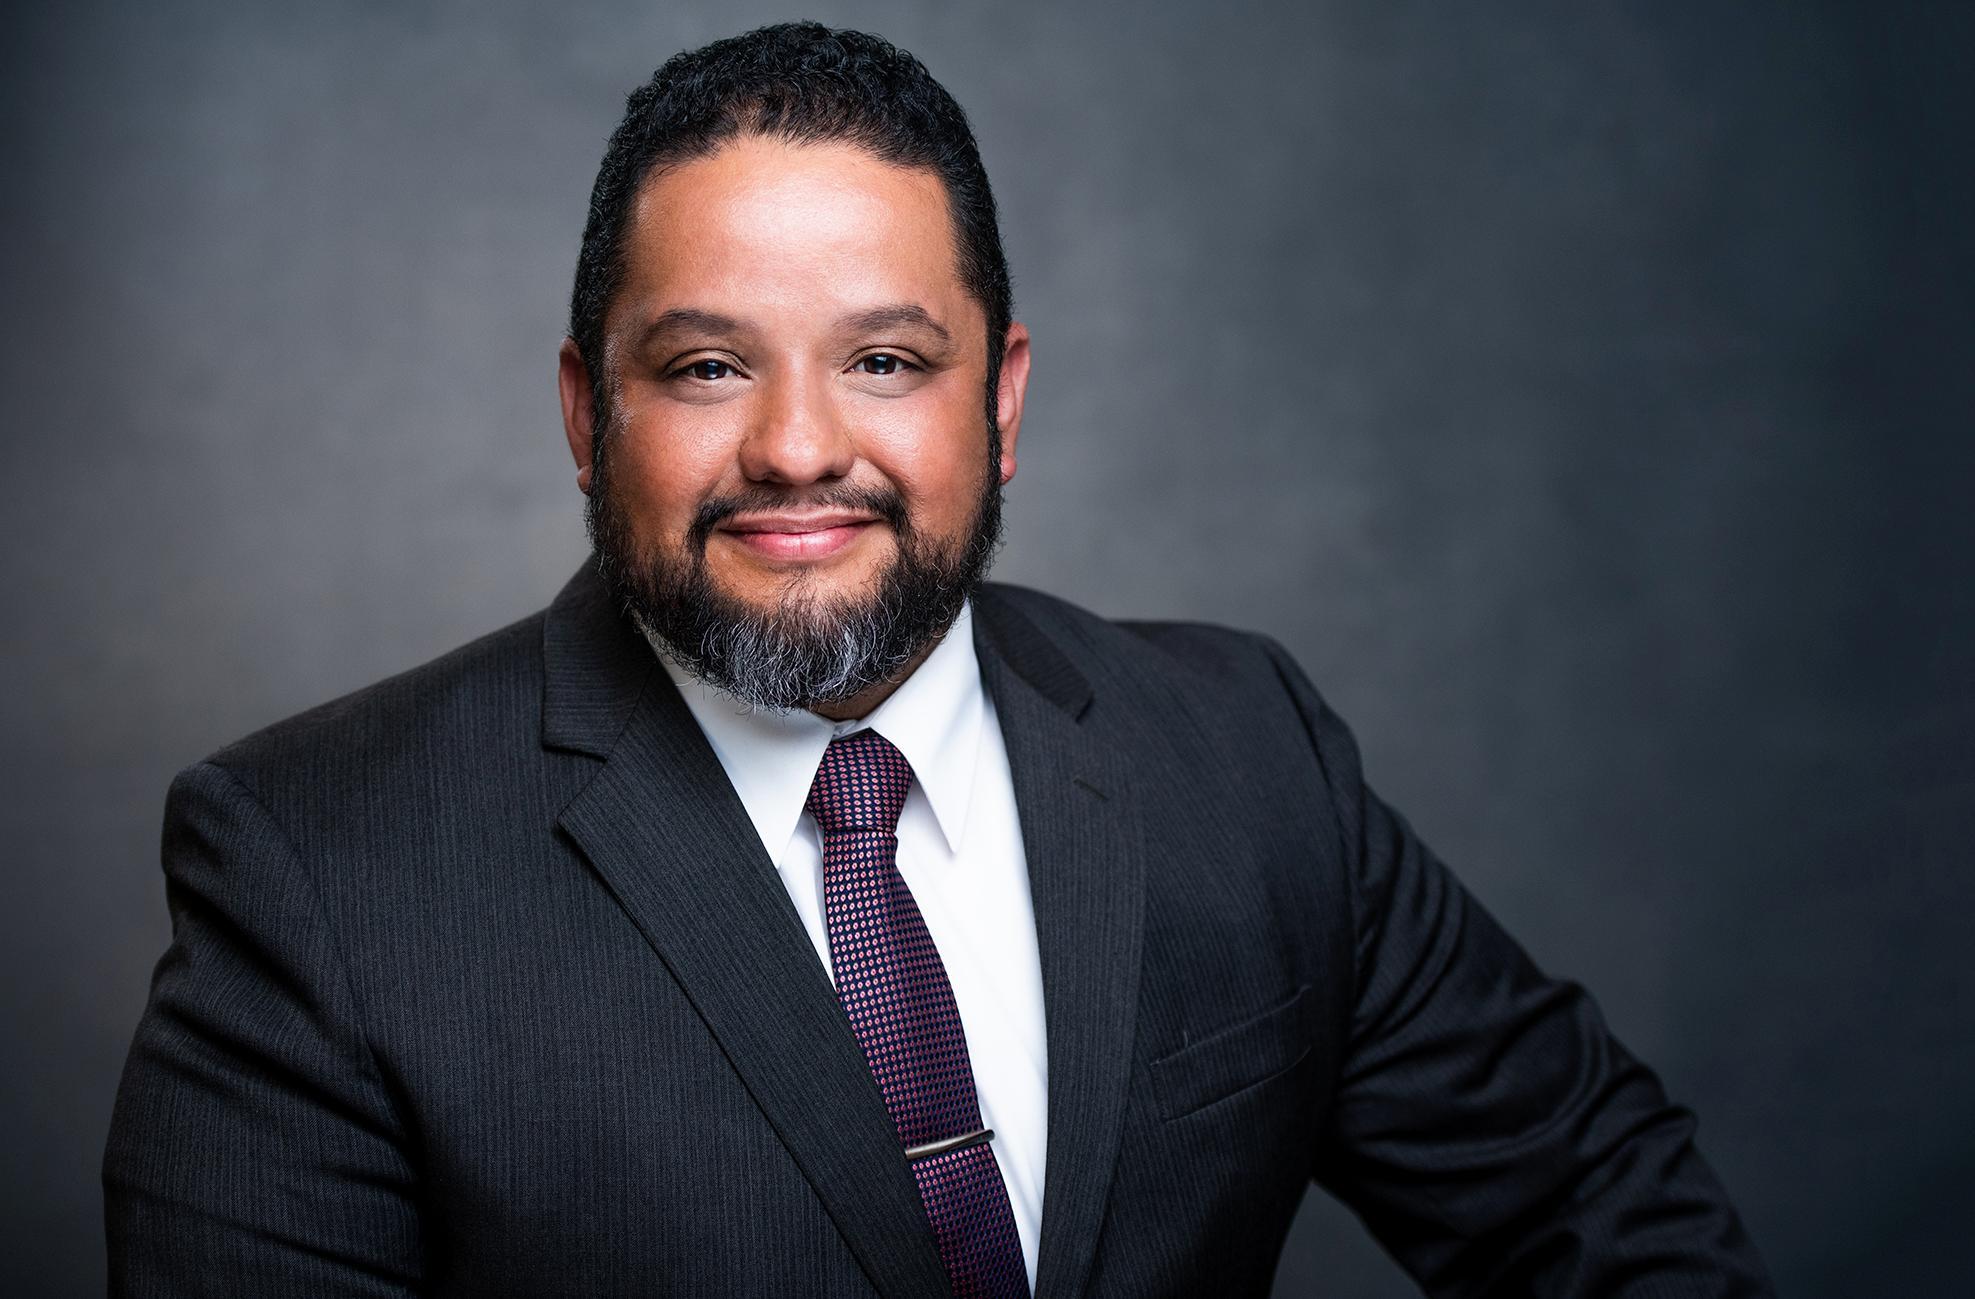 JOE NICHOLAS MELCHOR  Your Financial Professional & Insurance Agent